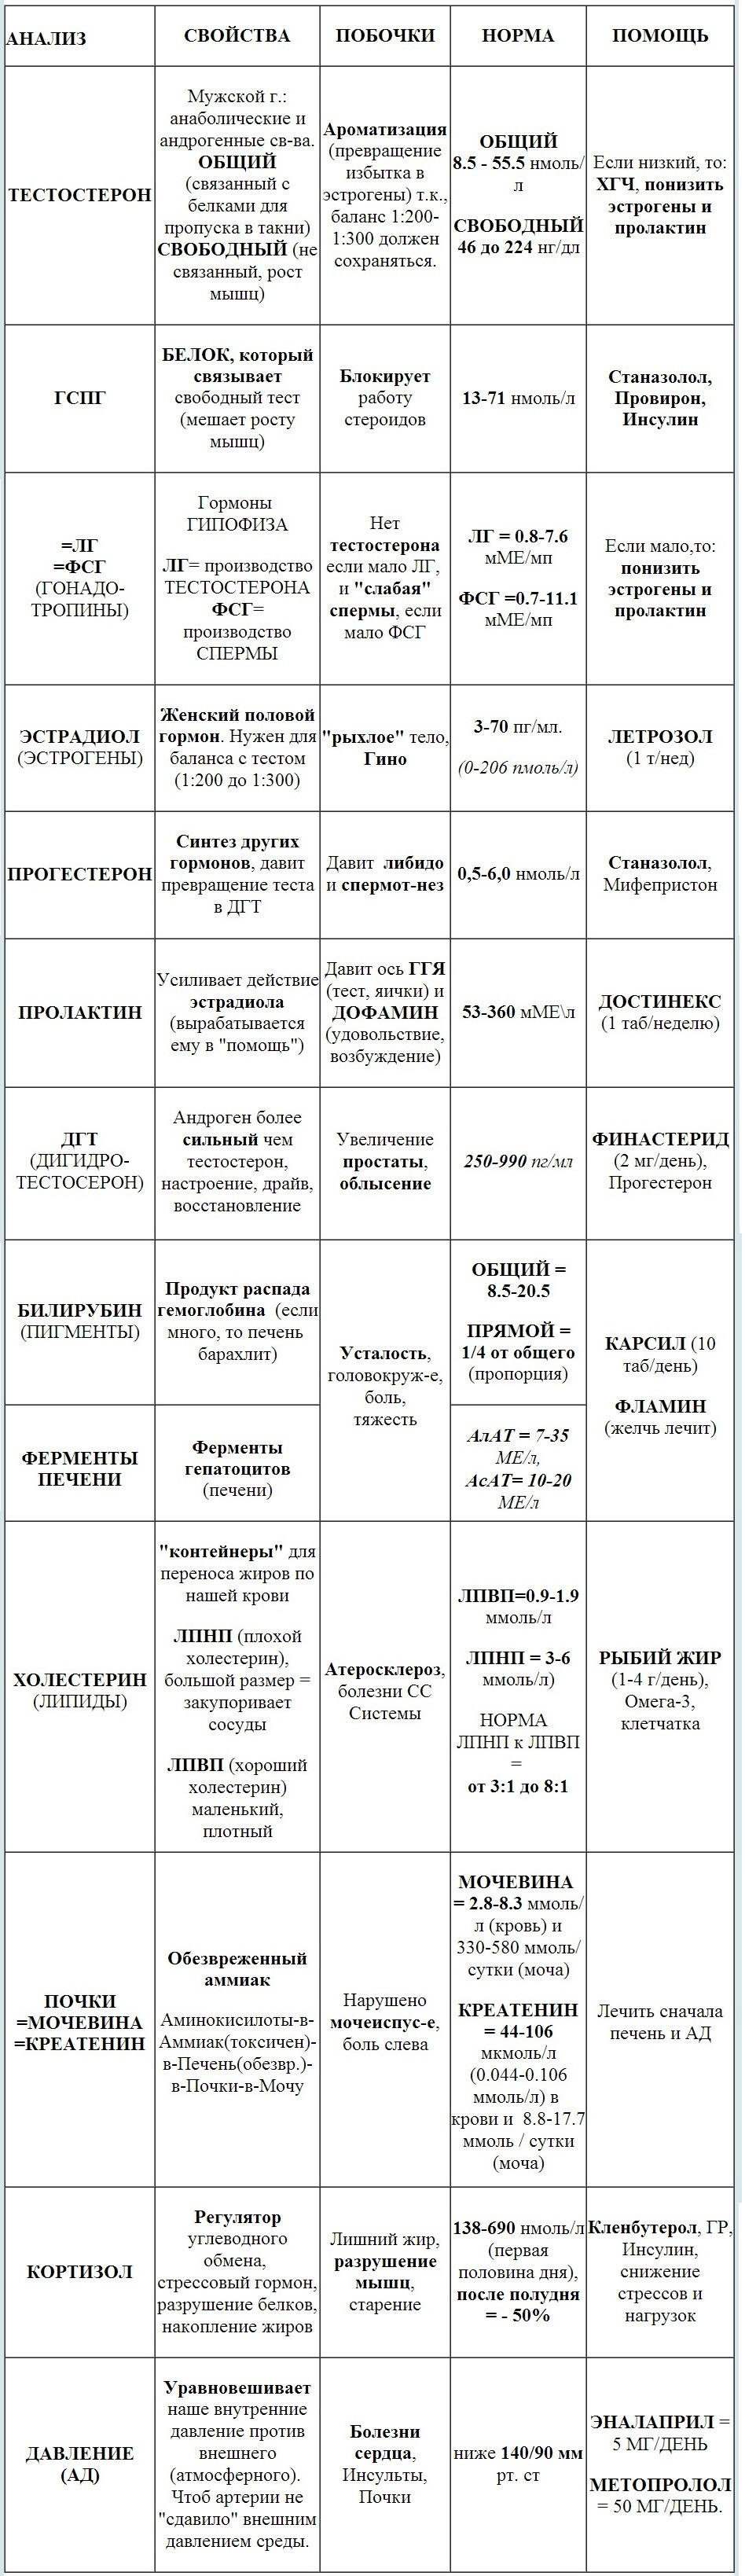 таблица АНАЛИЗа ГОРМОНОВ И ДР. ПАРАМЕТРОВ